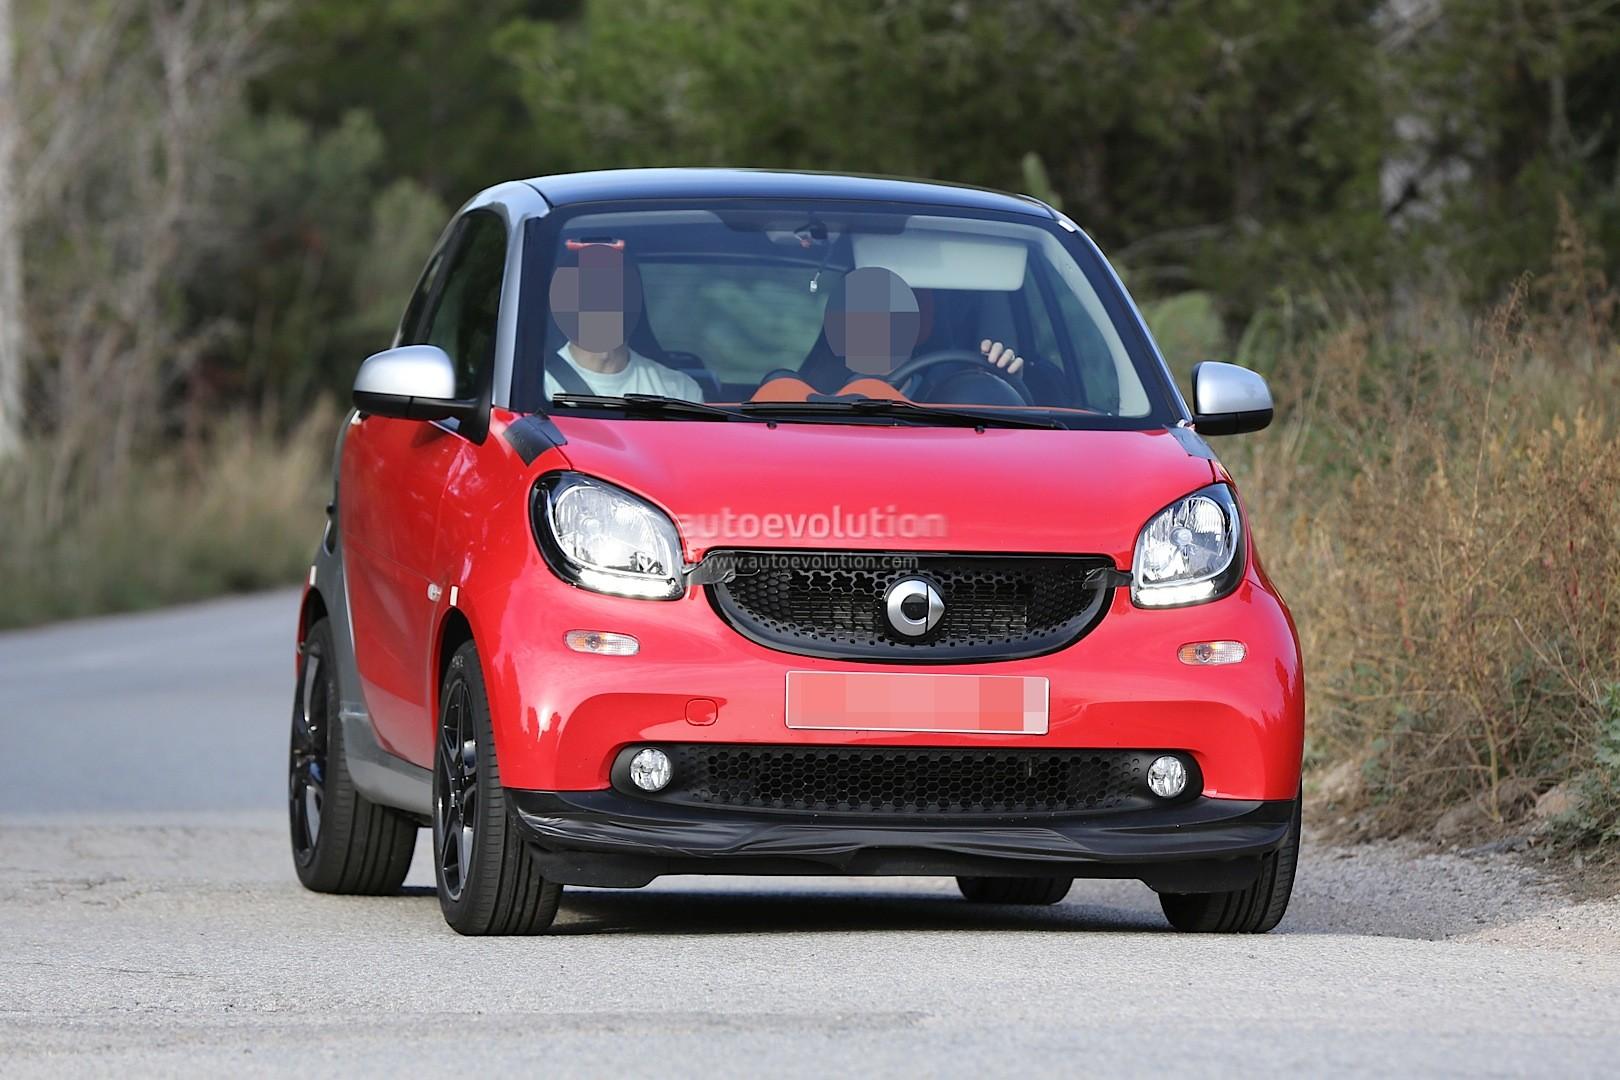 Spyshots 2015 Smart Fortwo Brabus Looks Hot Autoevolution